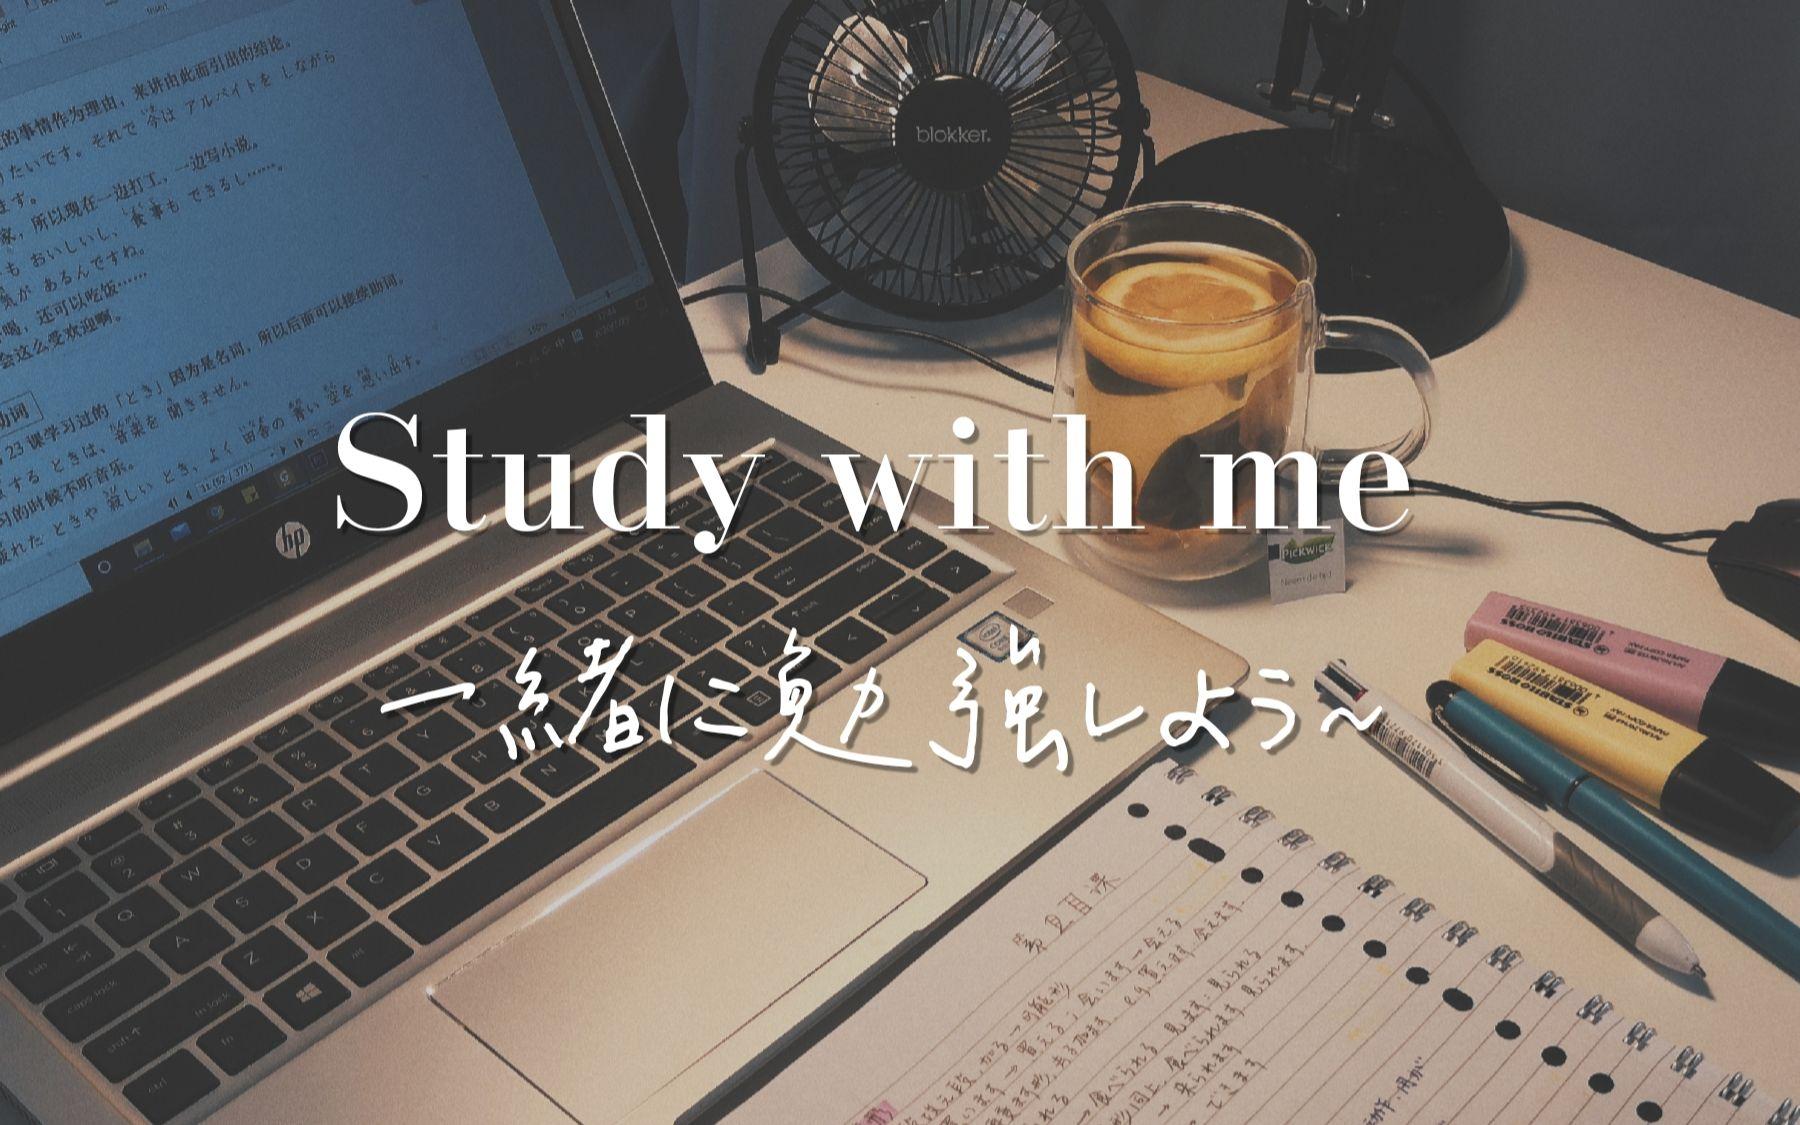 Study with me. 下午茶与实时学习. 白噪音 - Real time study